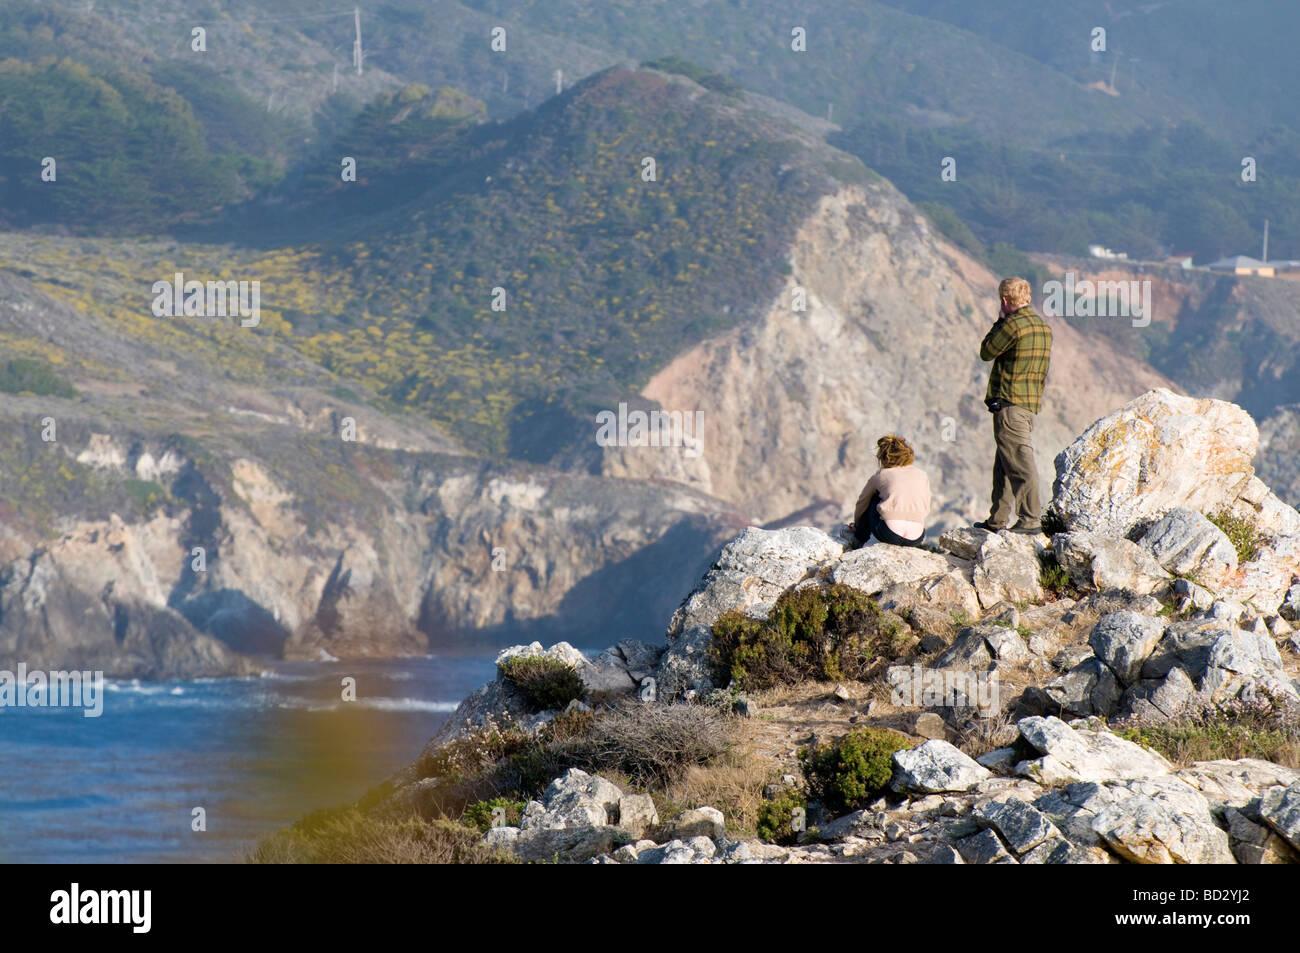 tourist overlooking the rocky coastal cliffs of Big Sur California - Stock Image